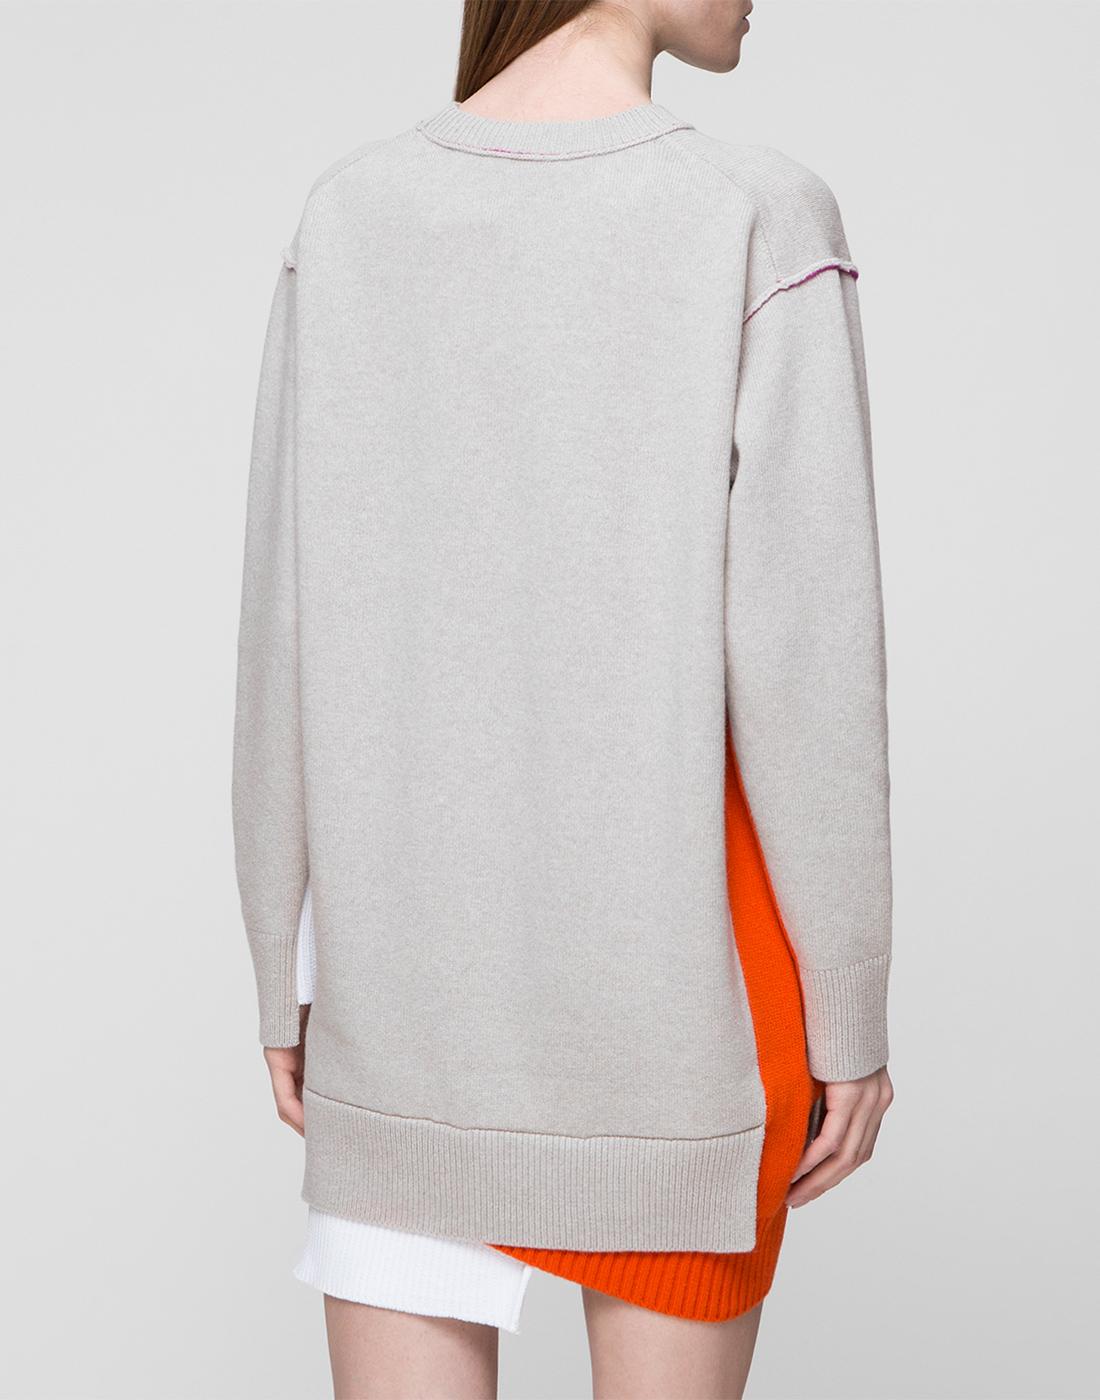 Женское бежевое шерстяное платье Dorothee Schumacher S516304/031-4